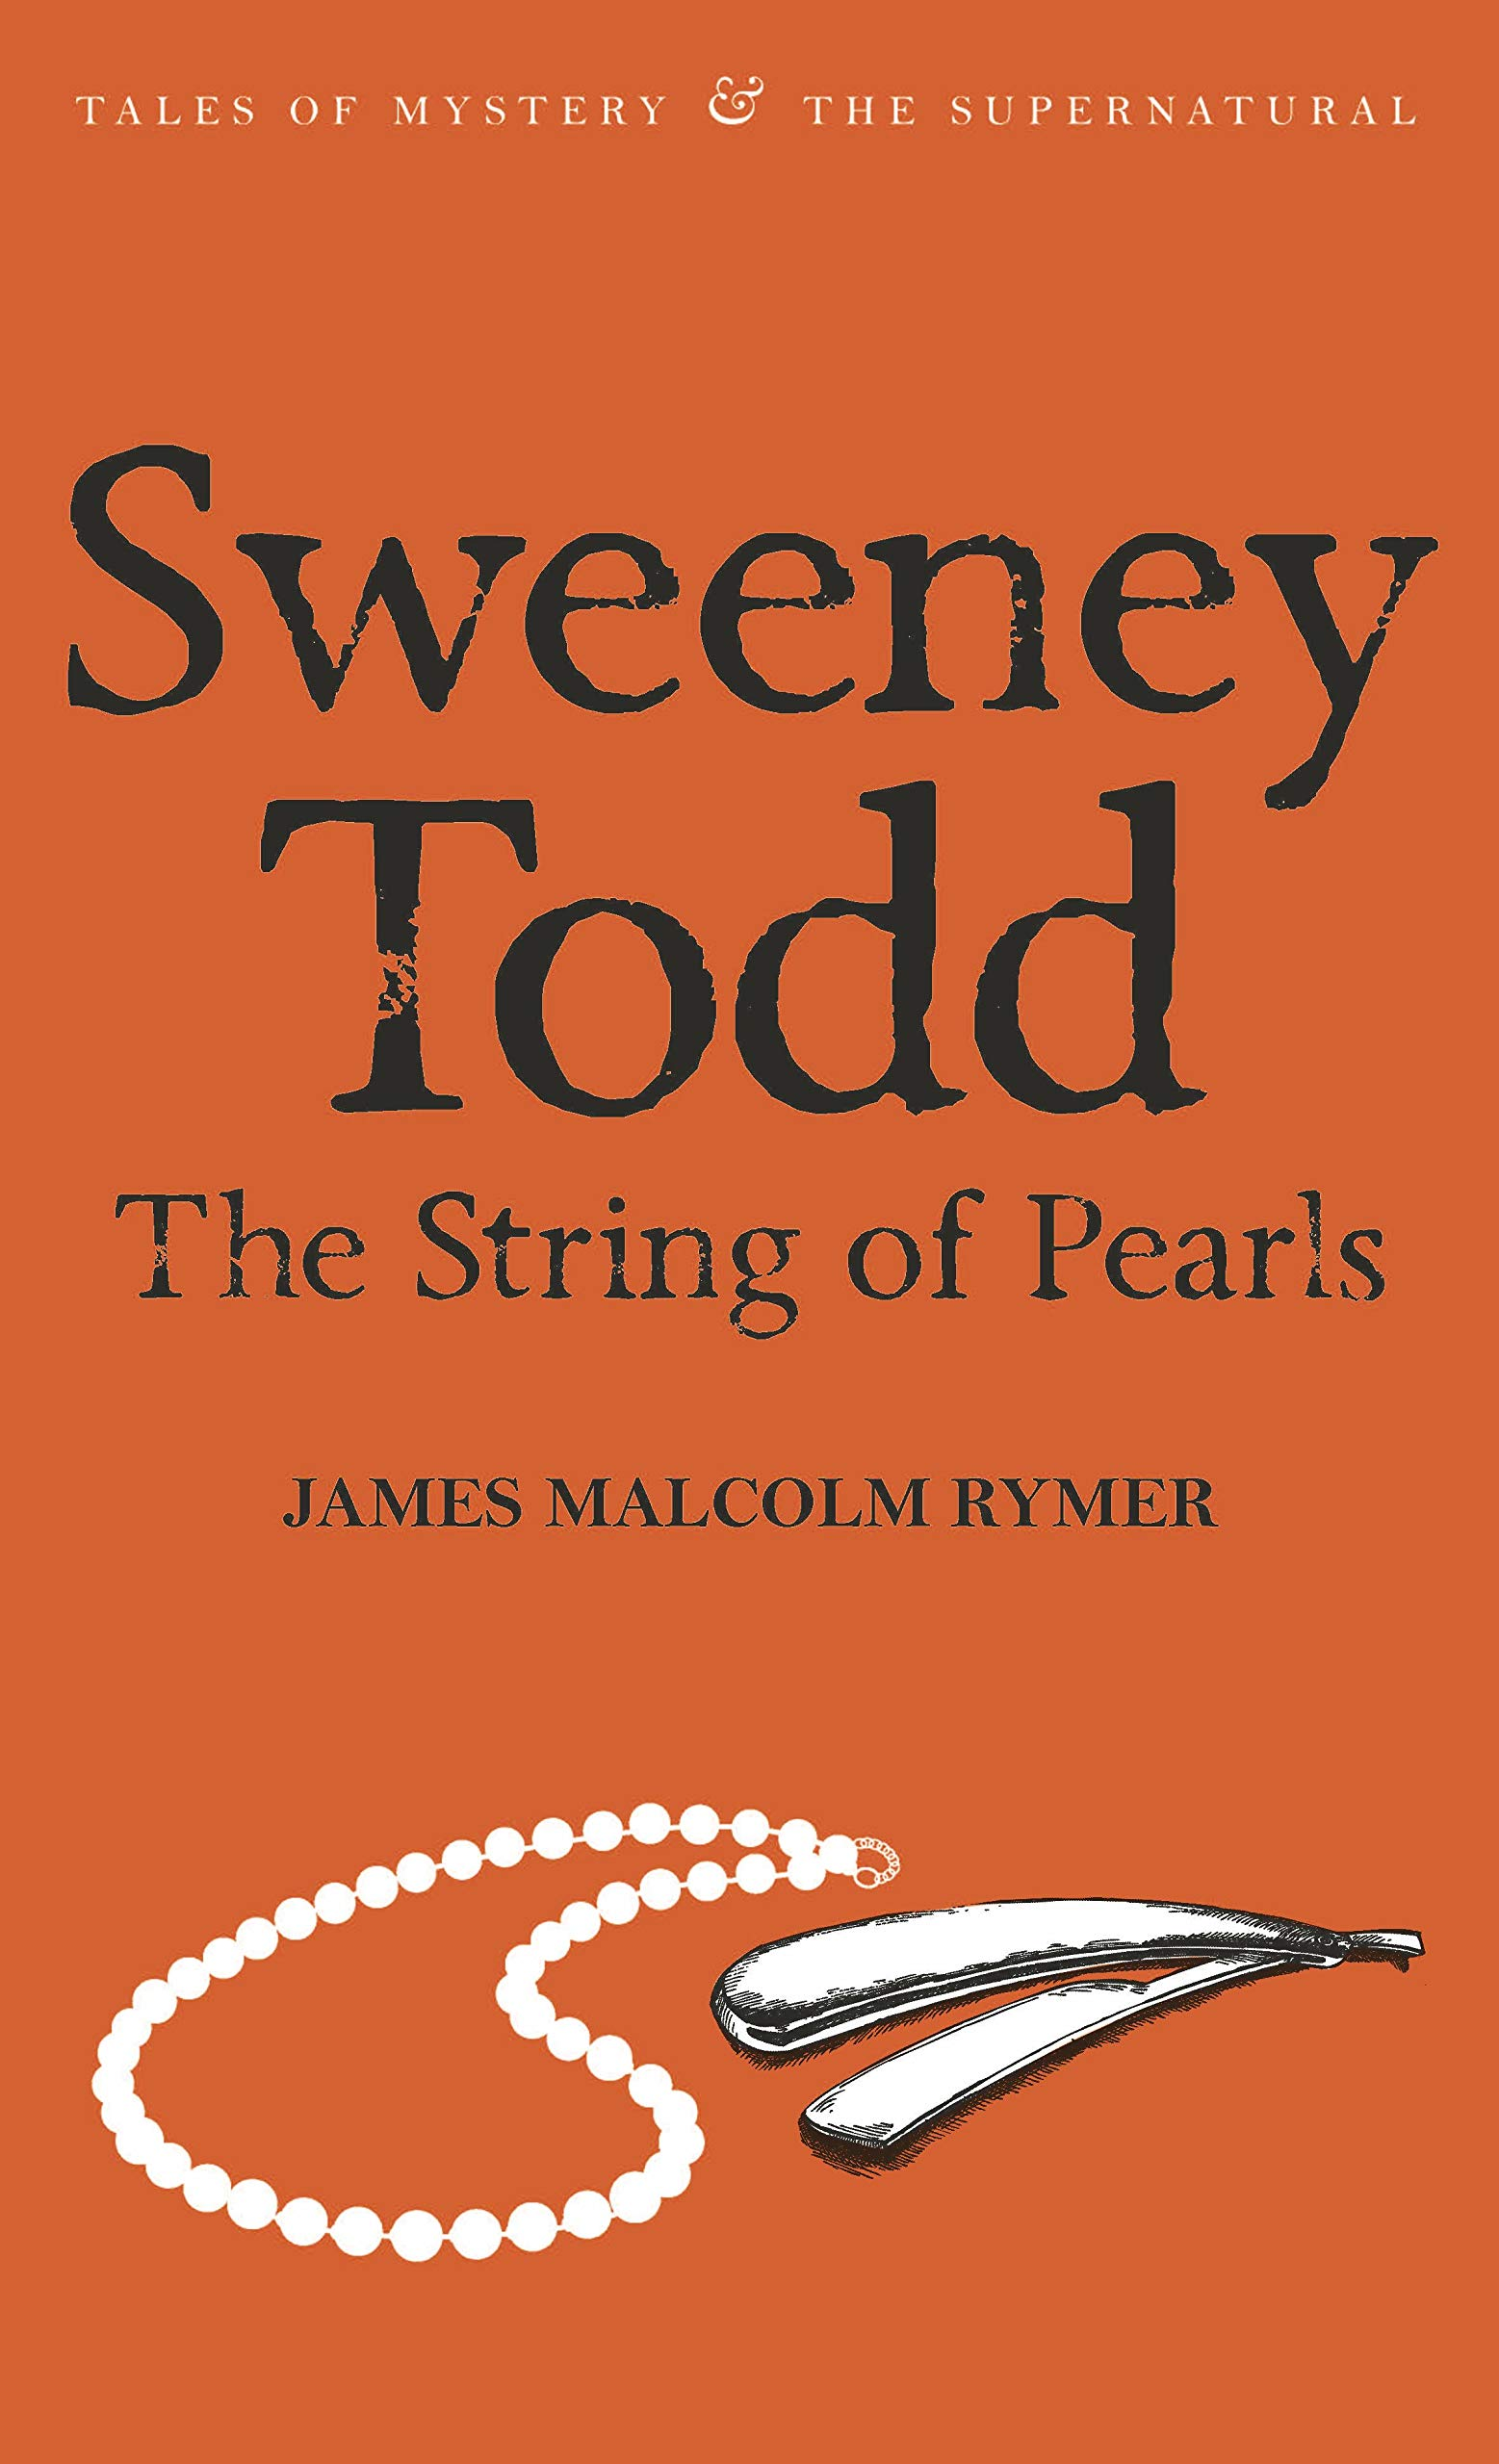 Amazon.fr - Sweeney Todd - the String of Pearls - Rymer, James Malcolm,  Collins, Dick, Davies, David Stuart - Livres